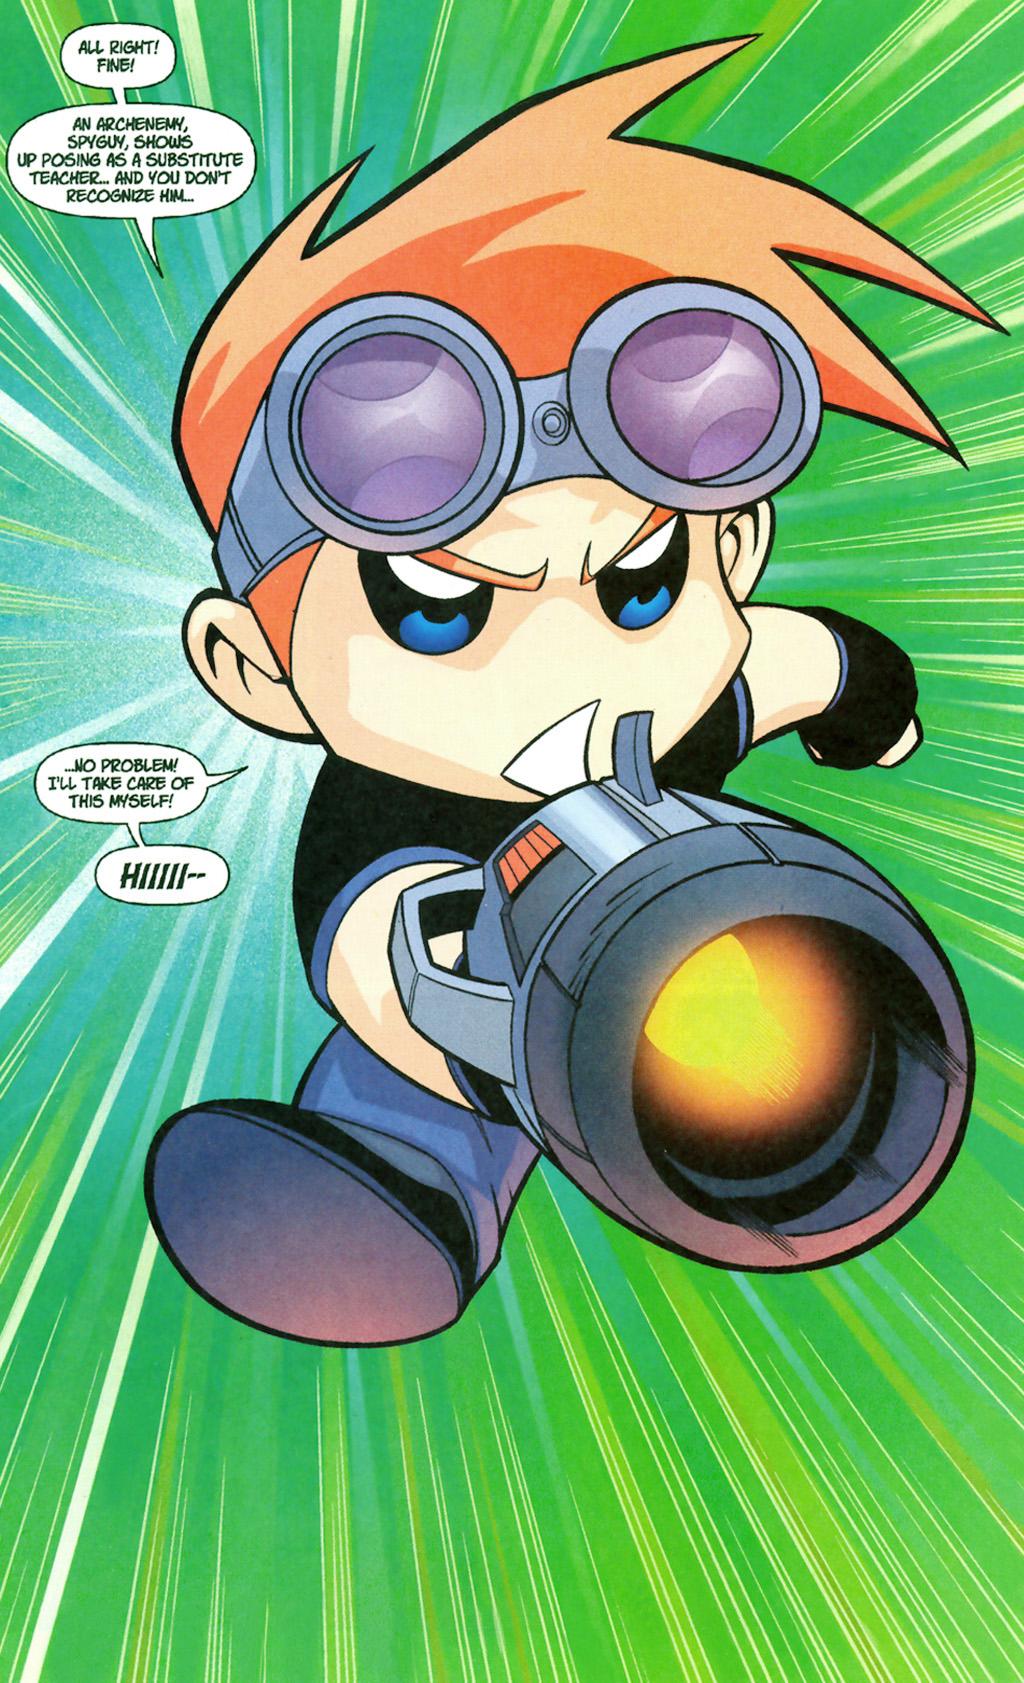 Read online SpyBoy: Final Exam comic -  Issue #2 - 3